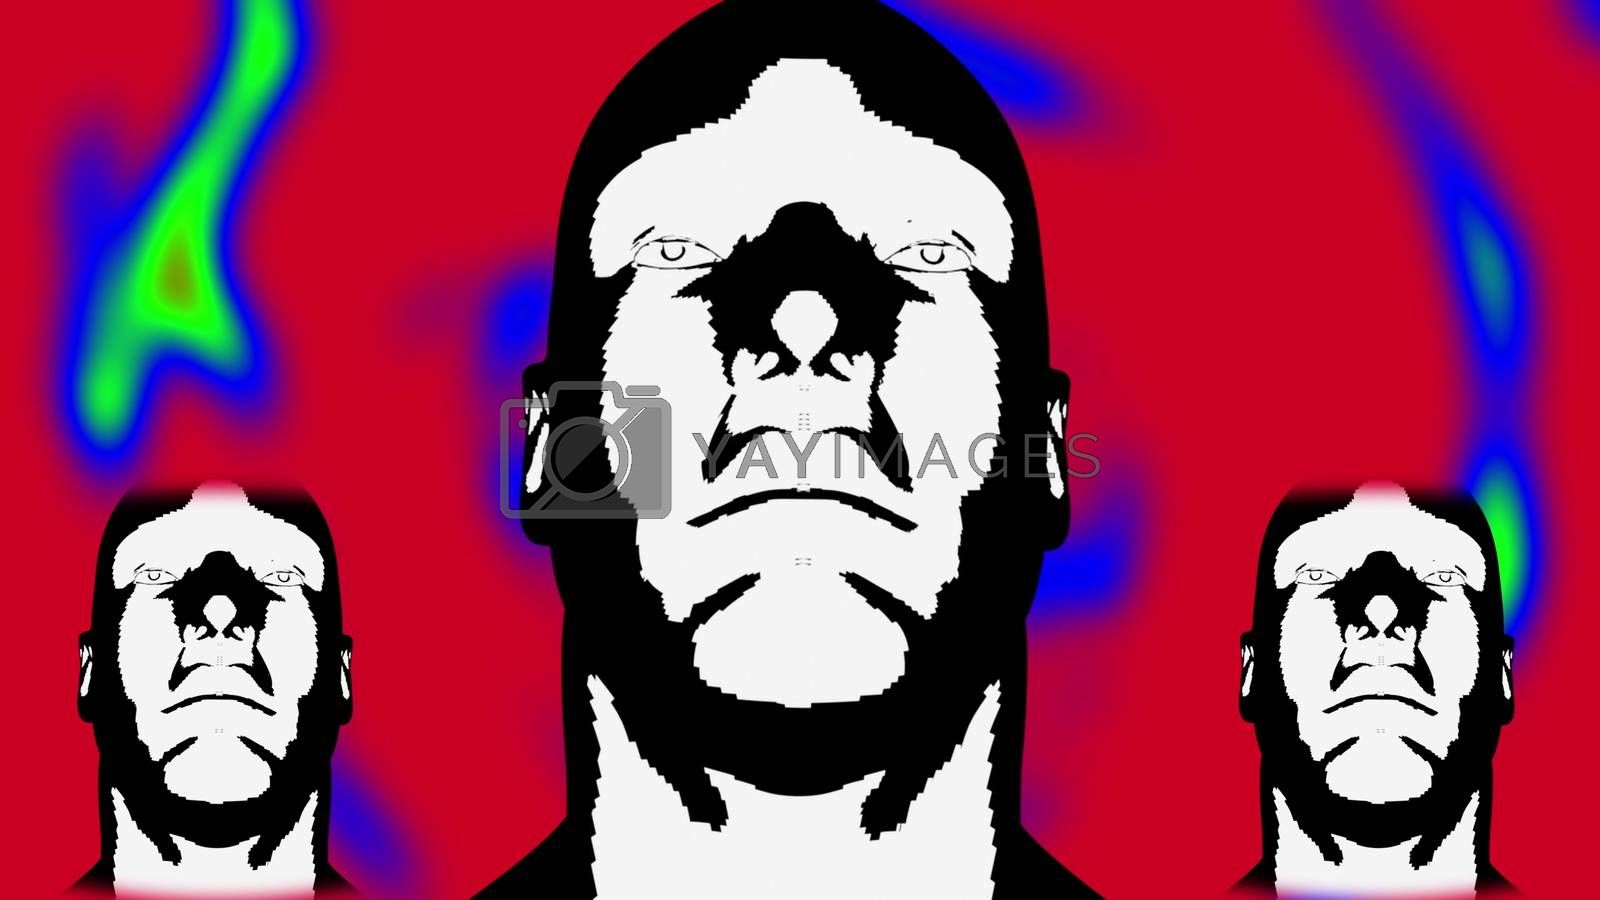 Dance of three cartoon white human head, 3d rendering. Computer generated futuristic background.